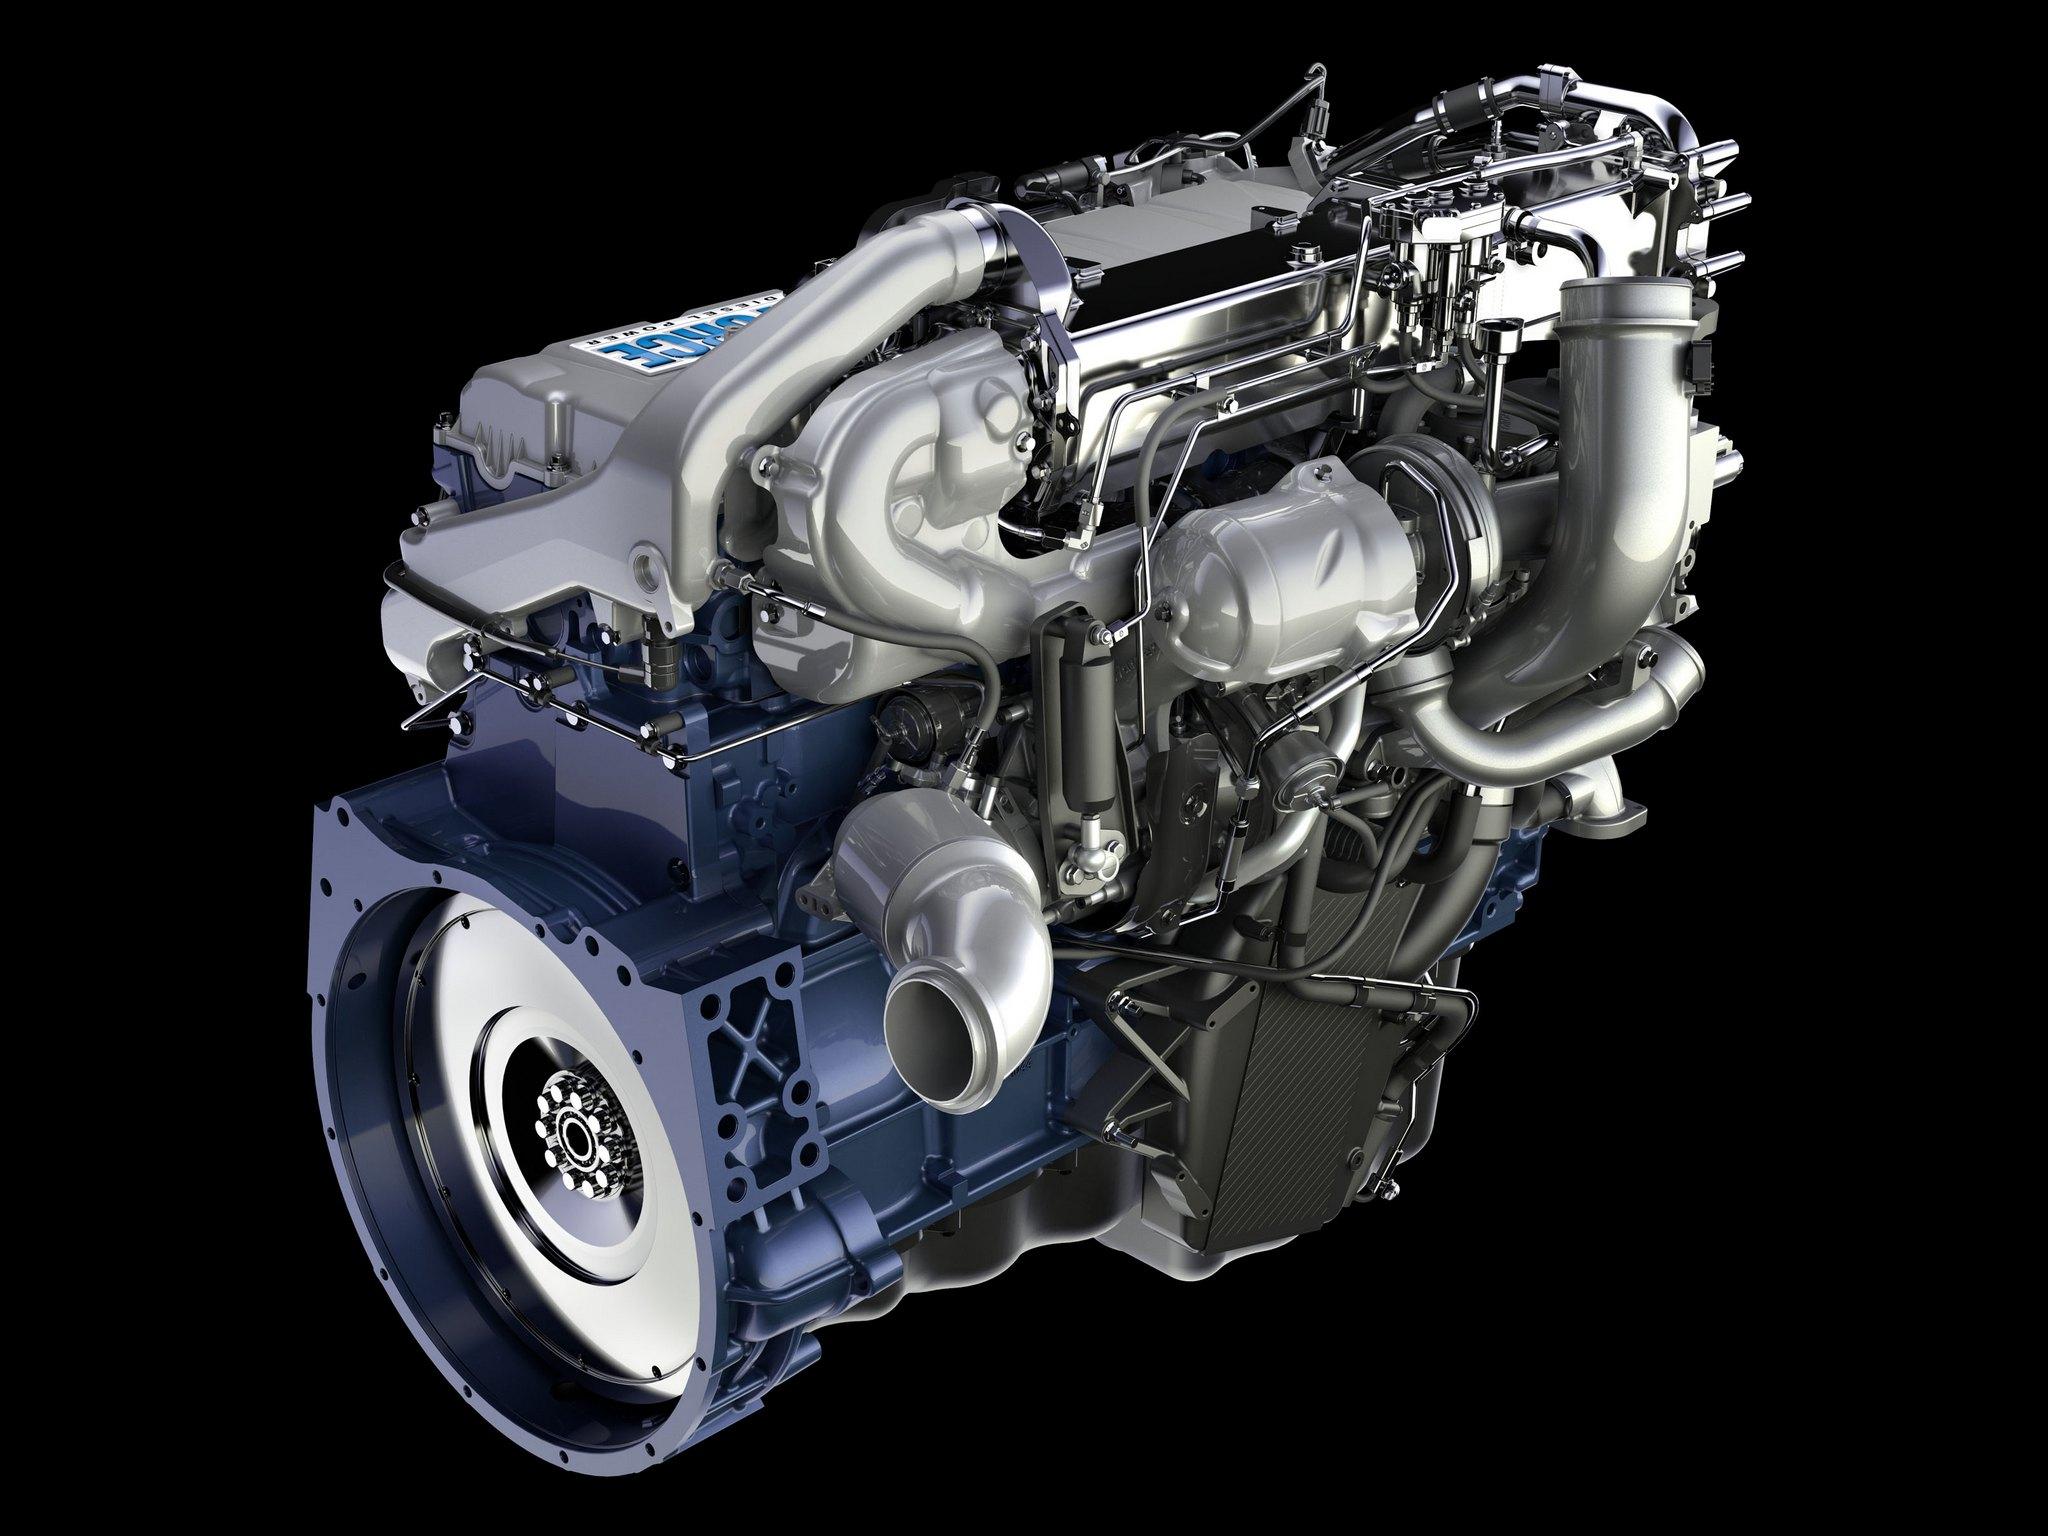 2009 international prostar semi tractor engine e 2009 international prostar semi tractor engine e 2048x1536 151270 up